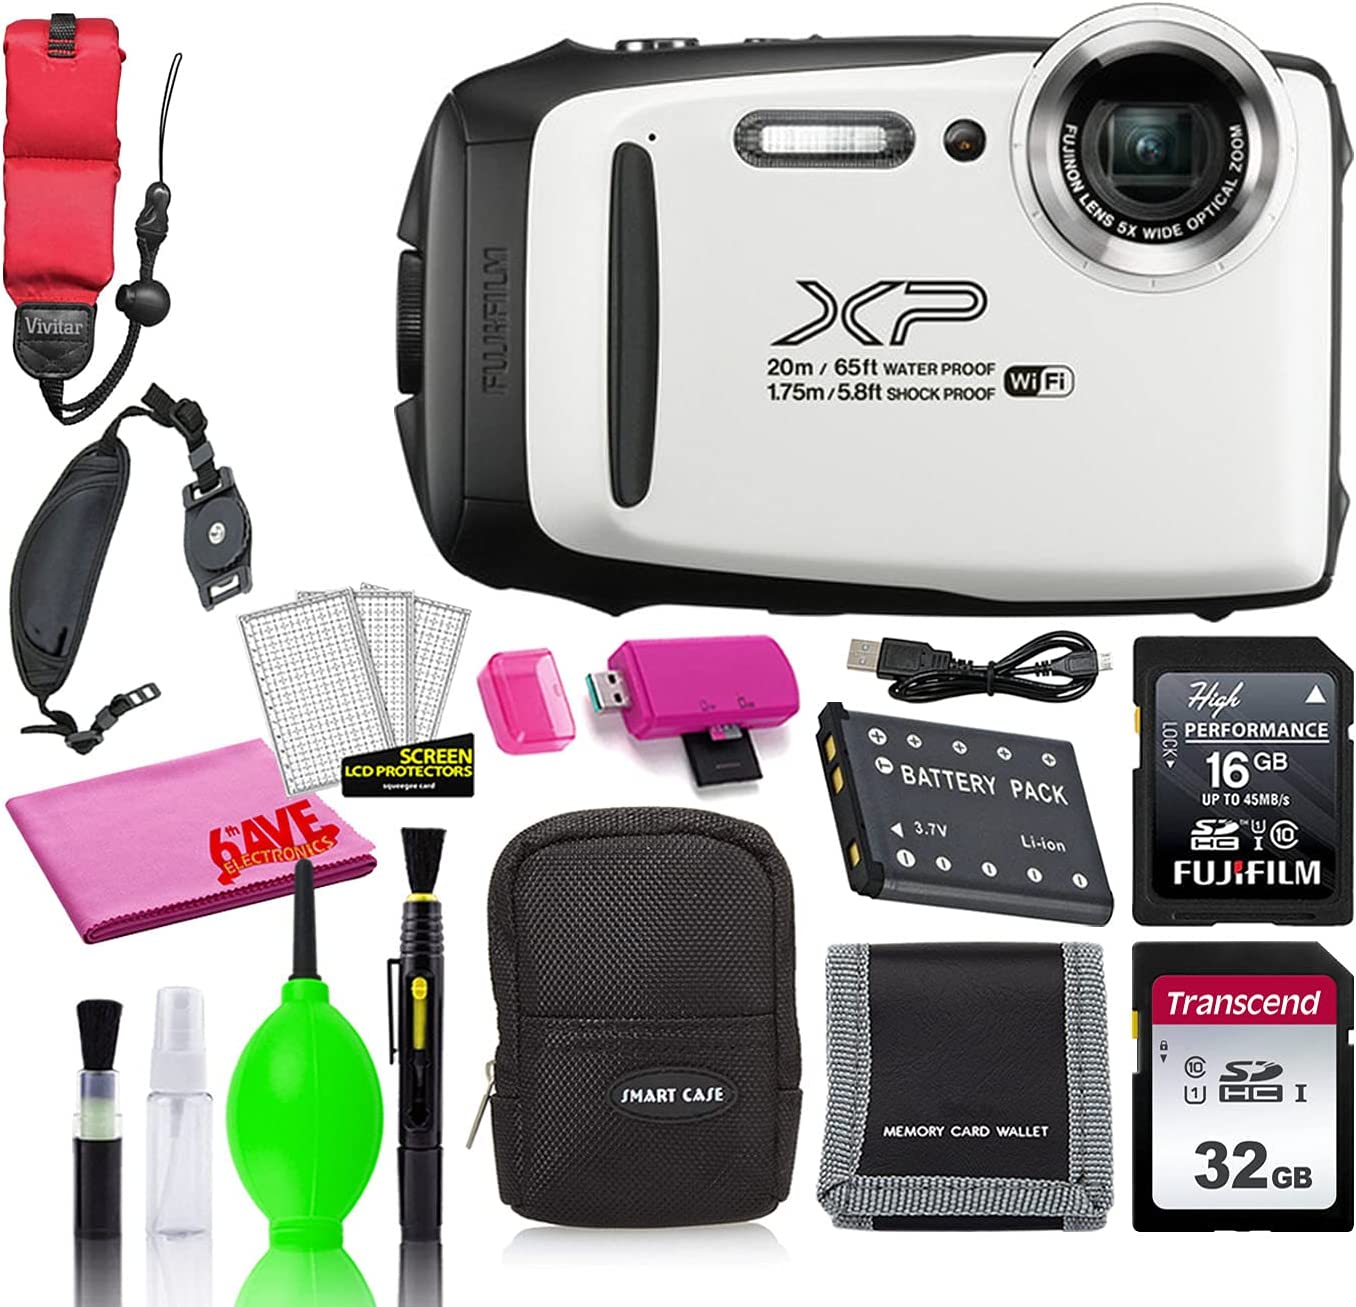 Nippon regular agency Fujifilm FinePix XP130 Waterproof Digital Accesso White Camera New arrival